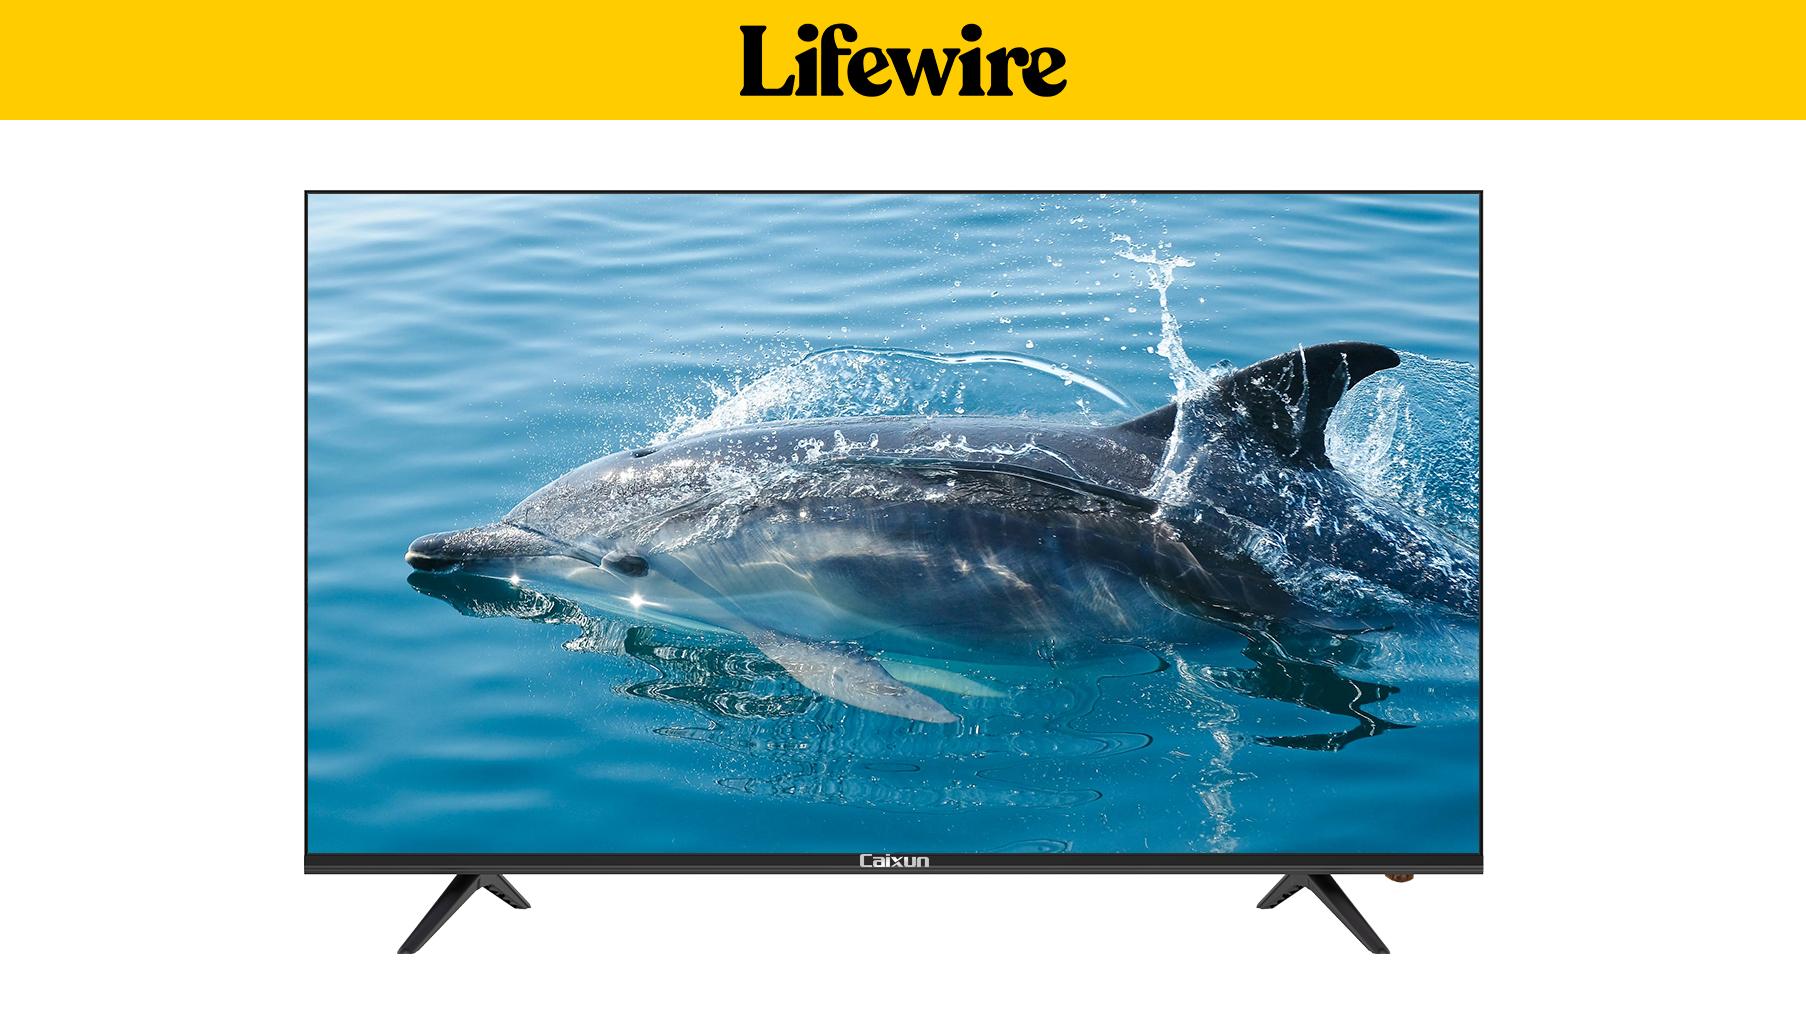 Caixun 4K Android TV 75-inch EC75E1A Review